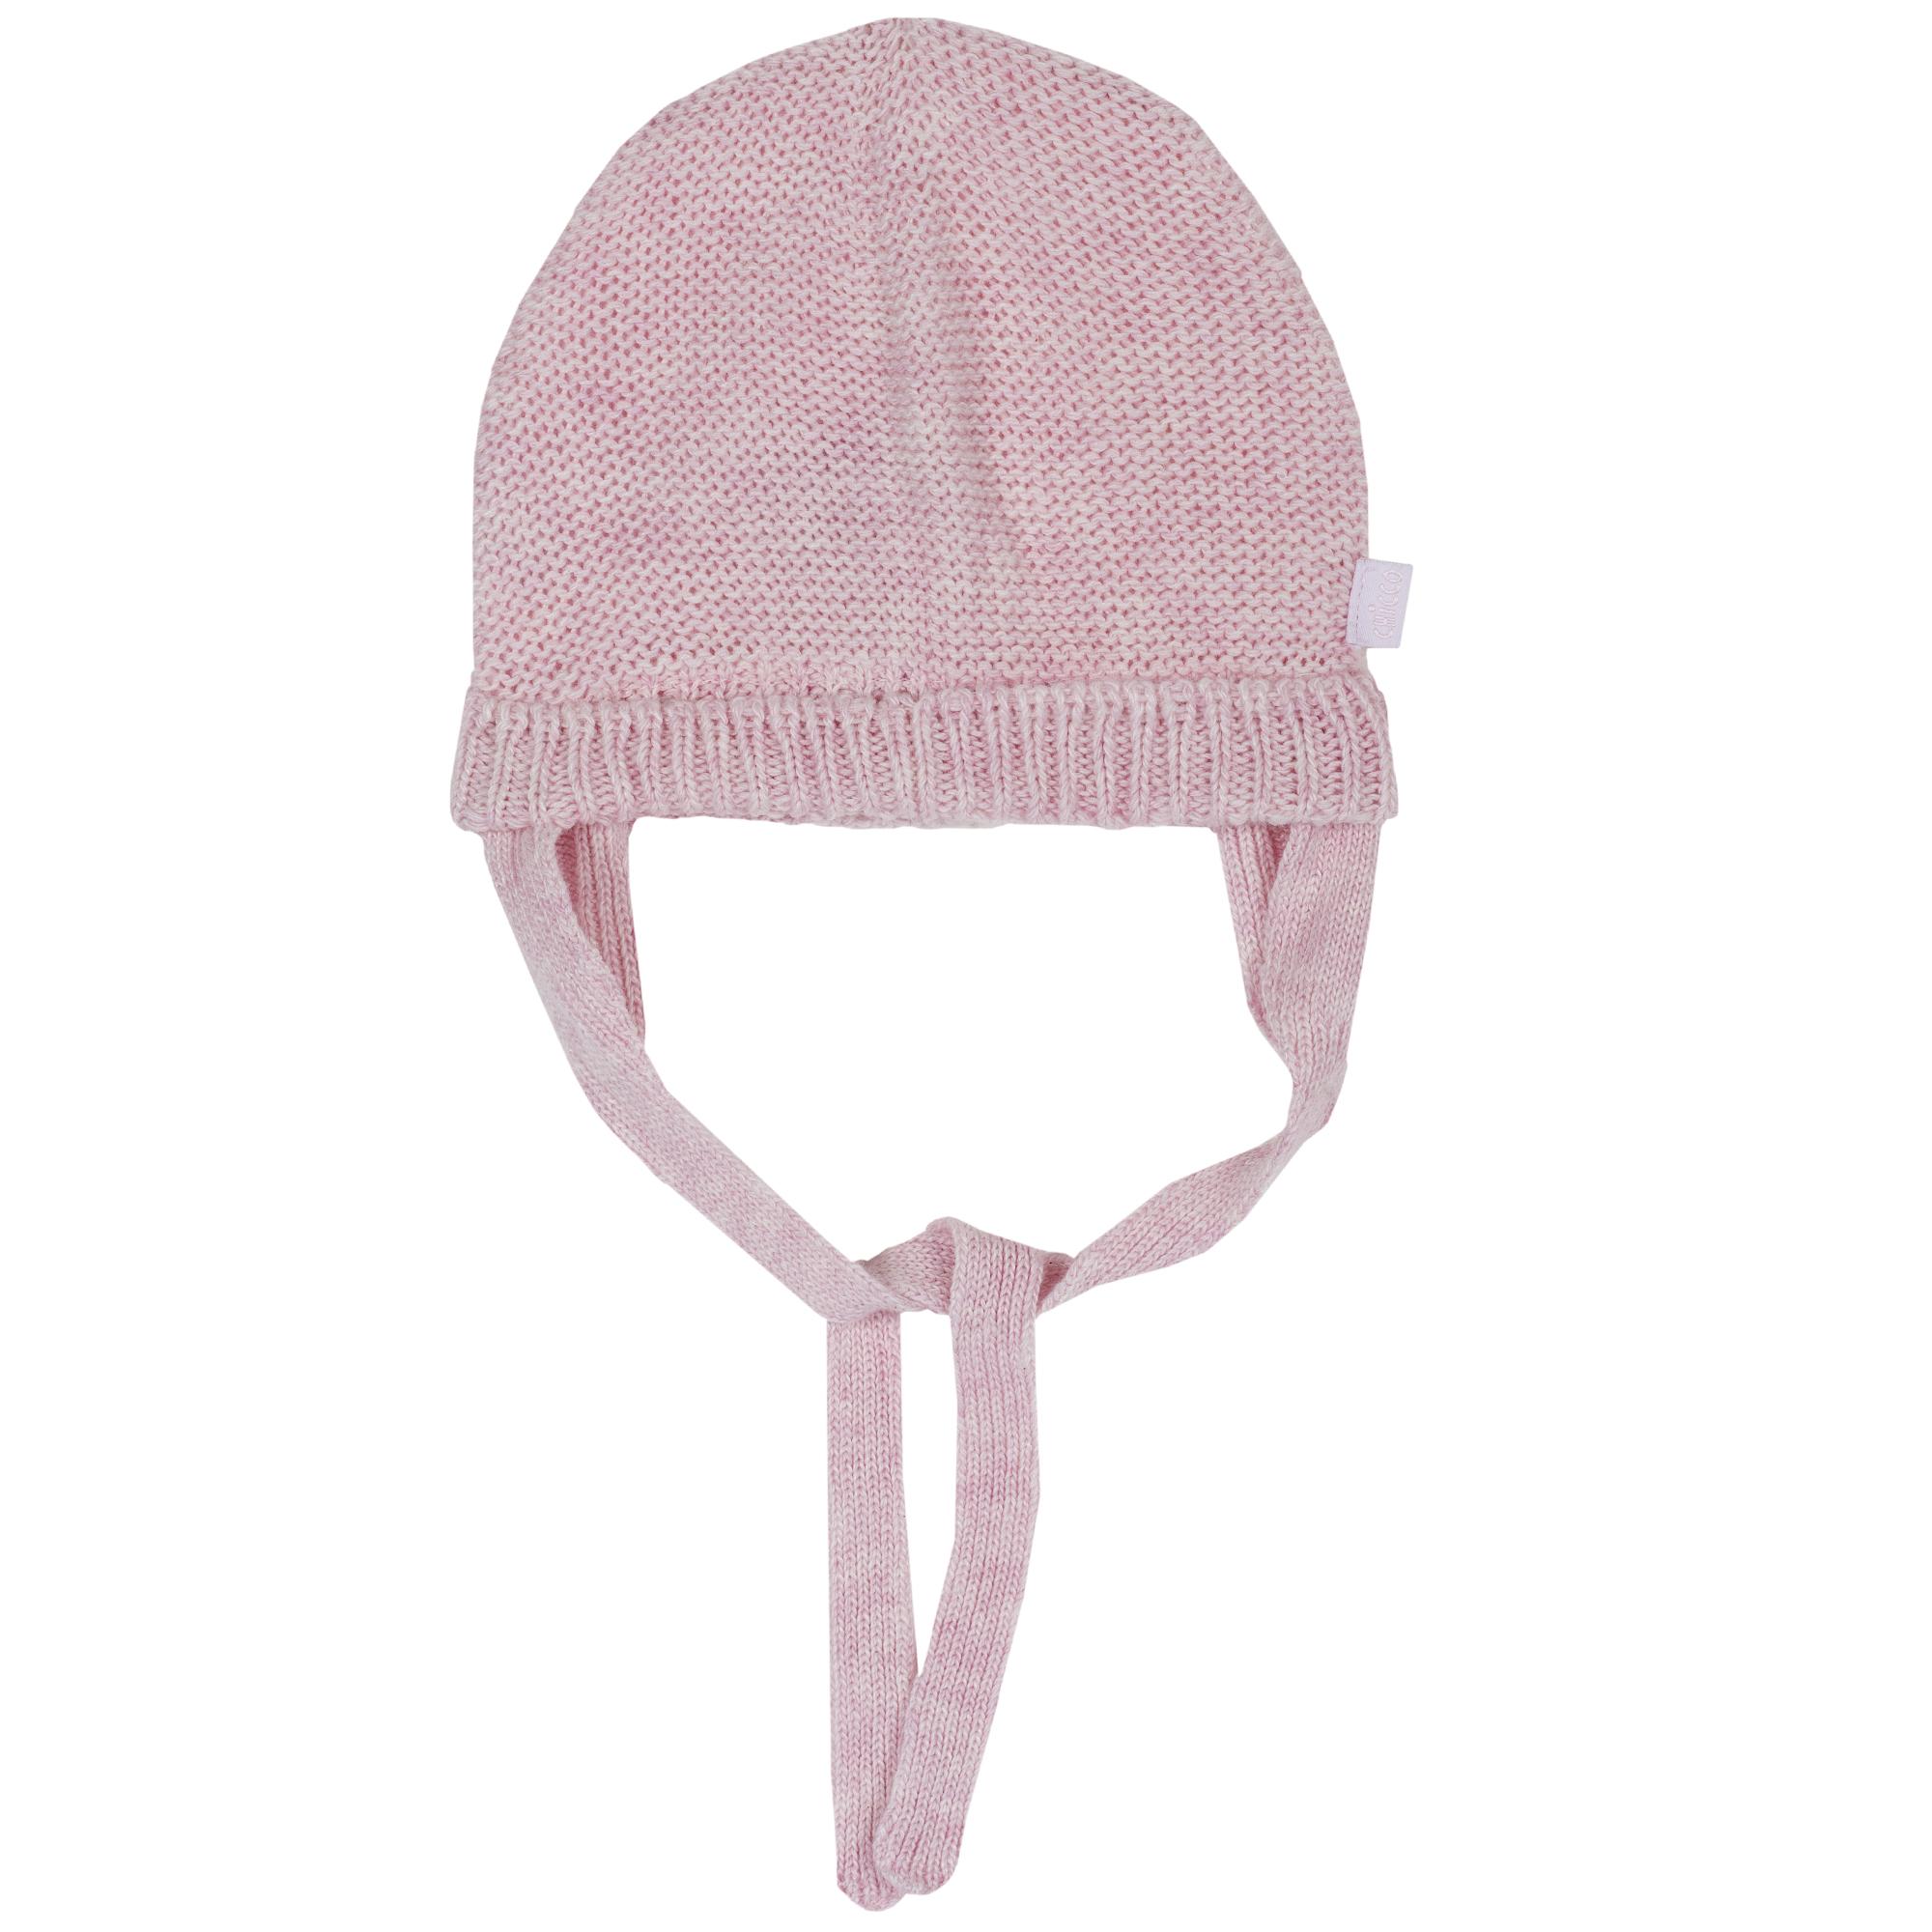 Caciula copii Chicco, tricotata, corai, 04542 din categoria Caciuli, Sepci